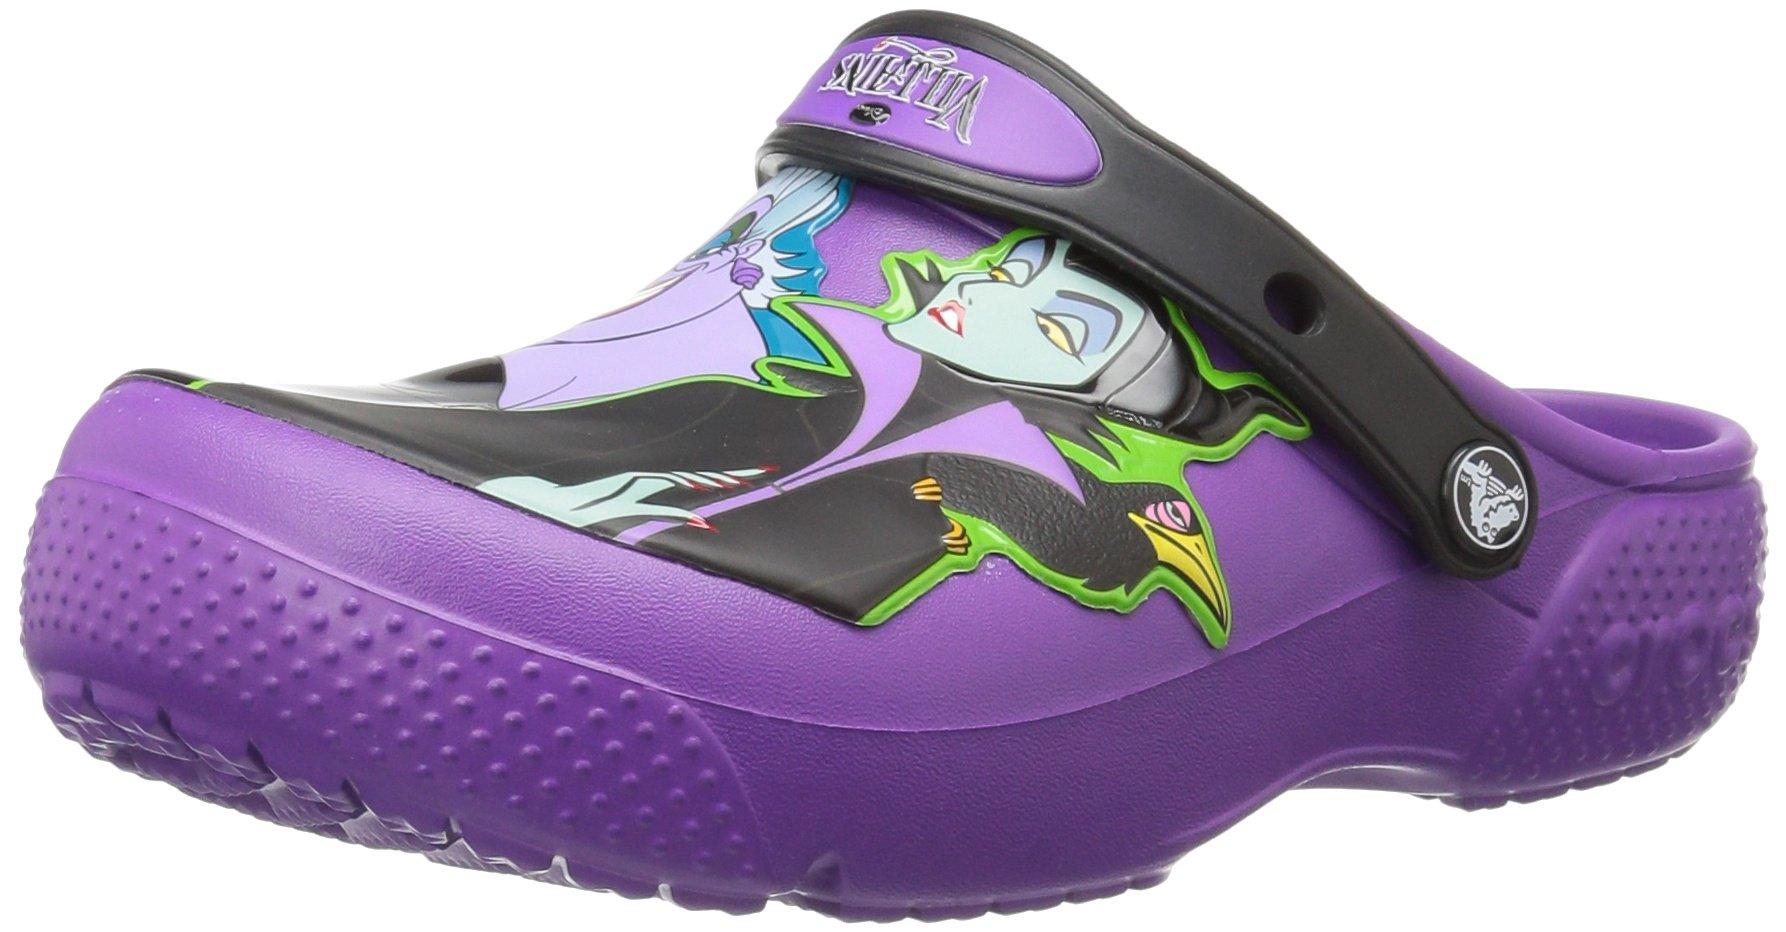 Crocs Girls' FL Disney Villain K Clog, Amethyst, 12 M US Little Kid